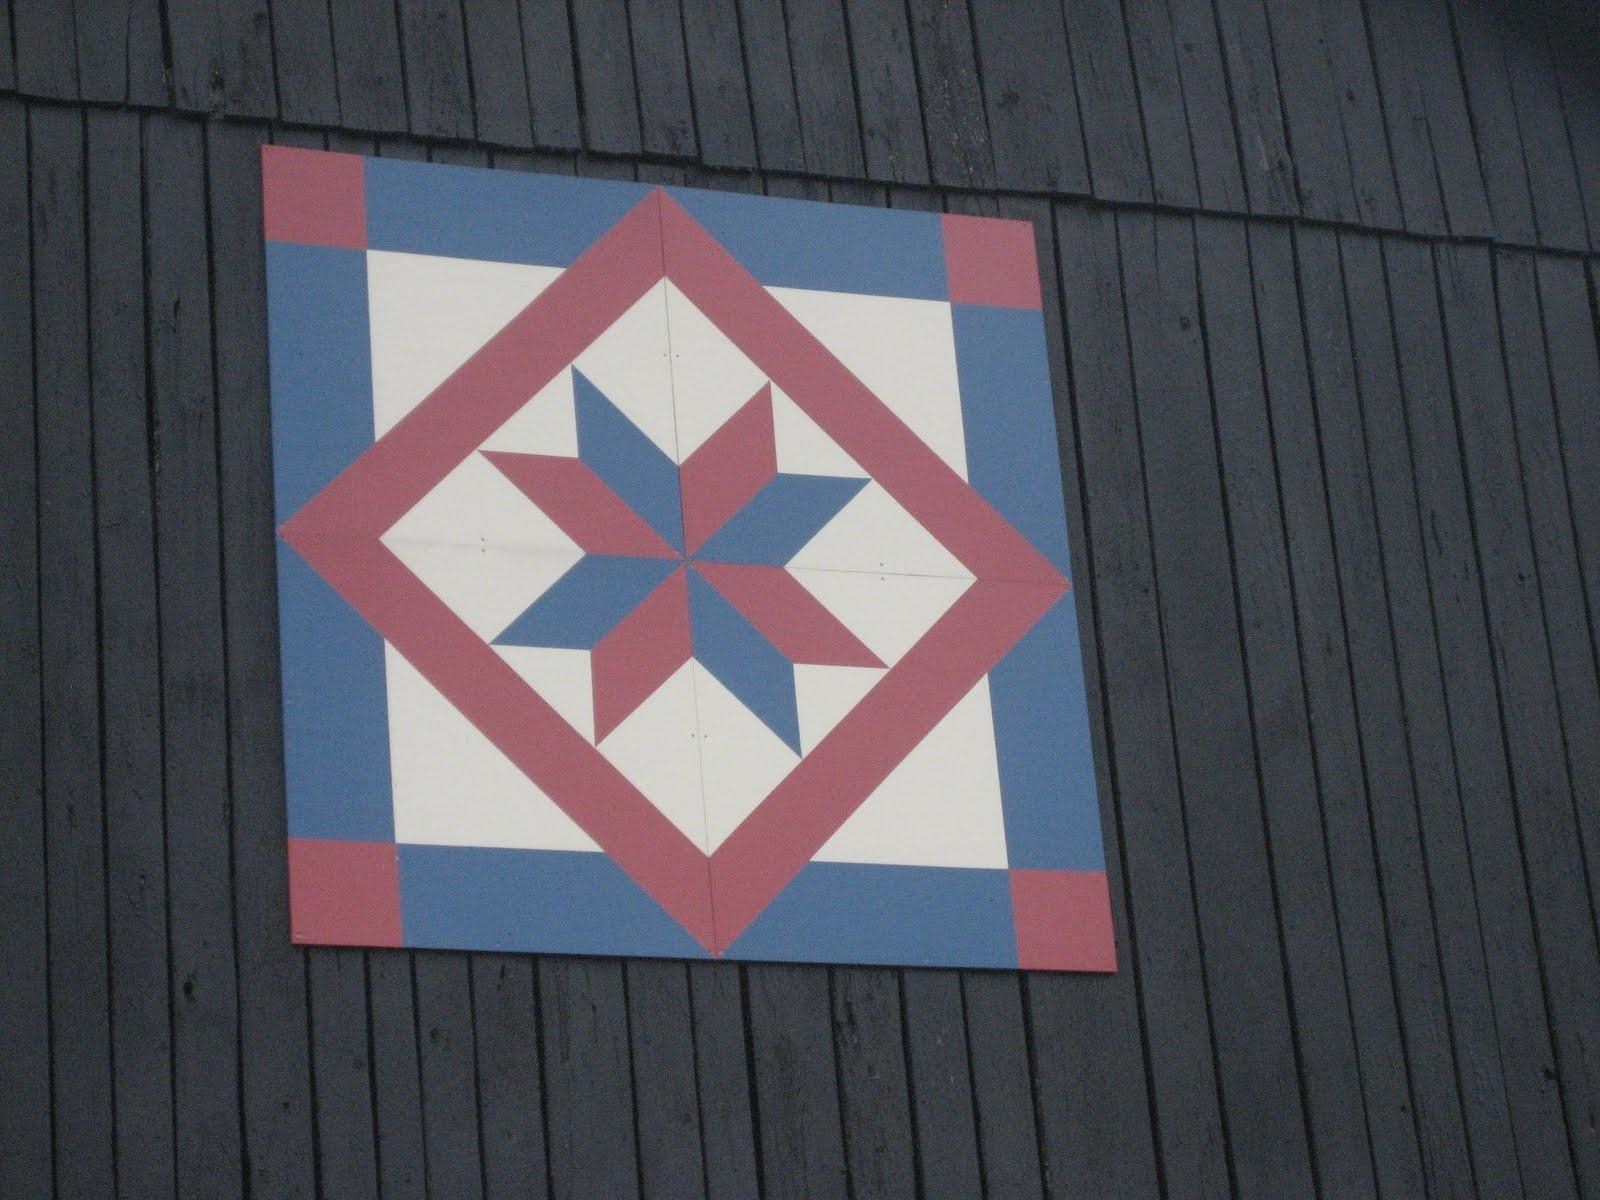 Simple Amish Barn Quilt Patterns   Joy Studio Design ...